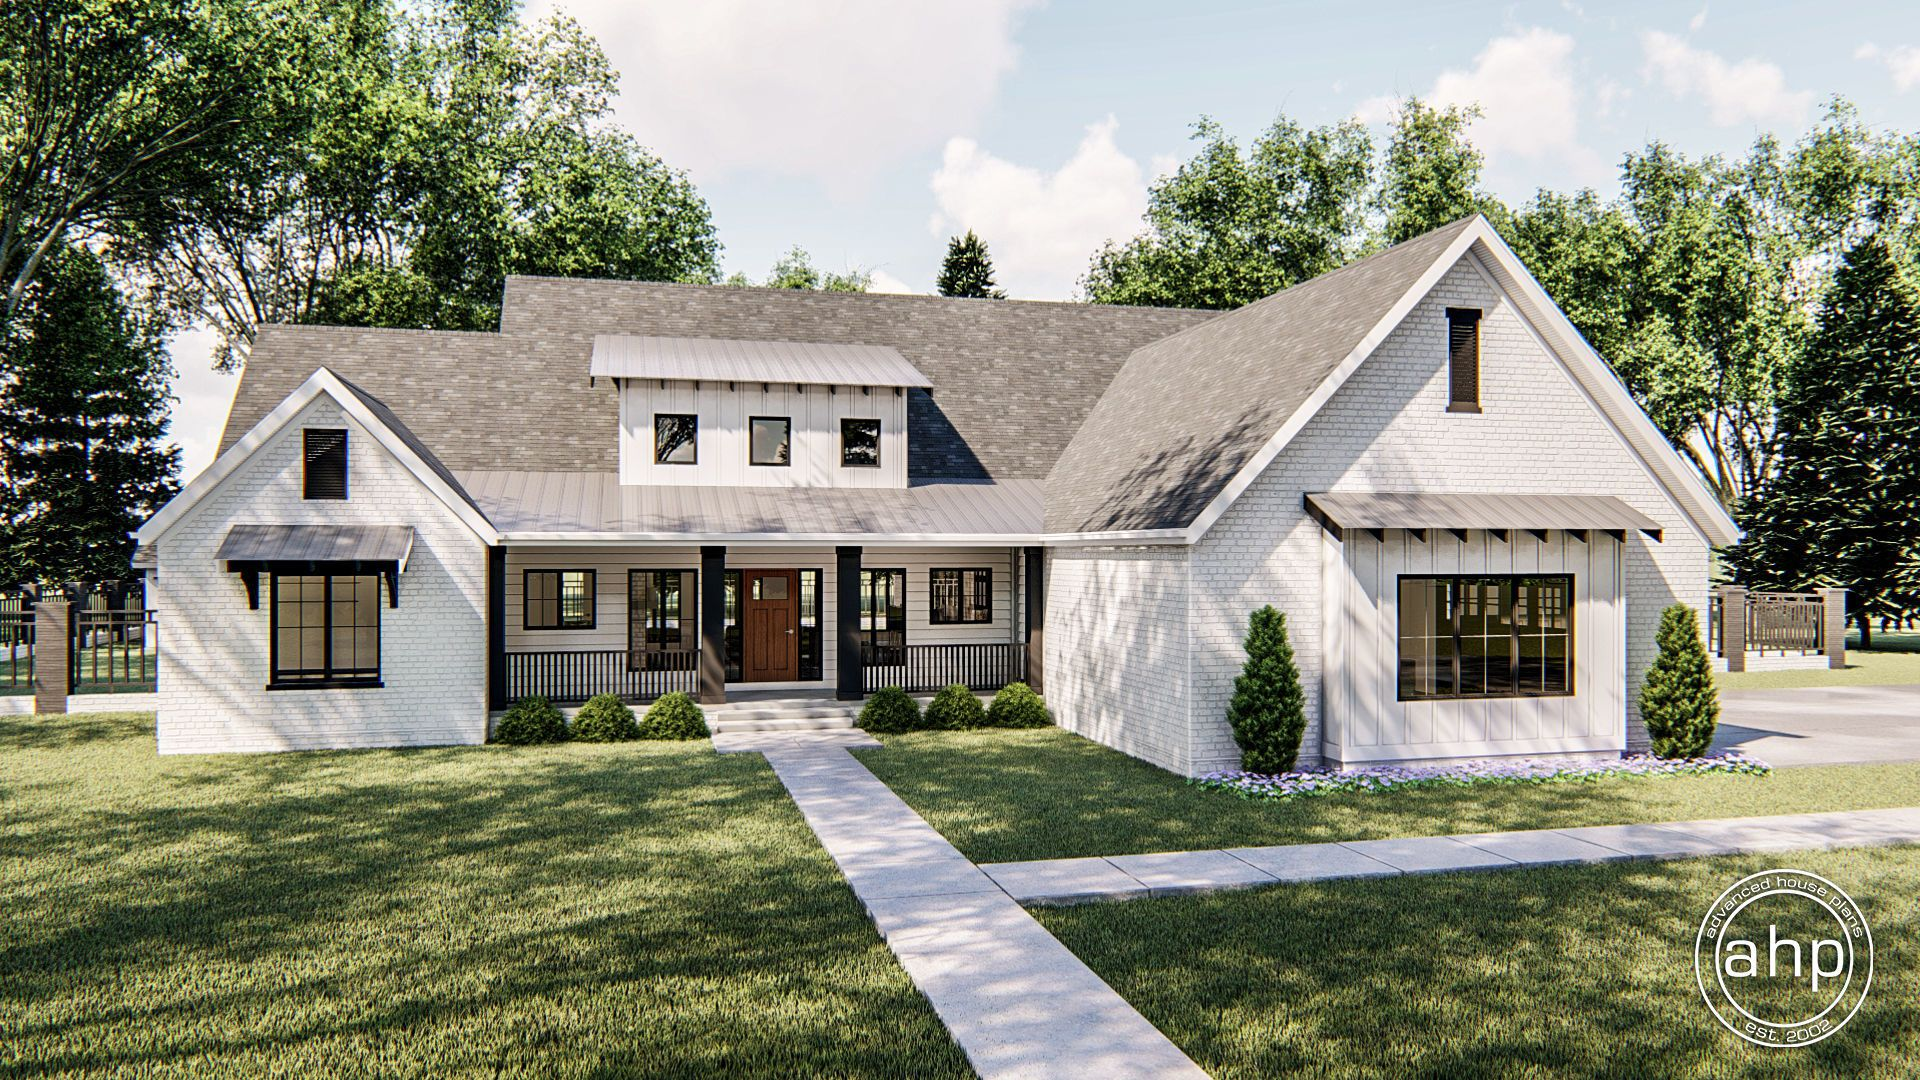 Vandyke 1 Story Modern Farmhouse House Plan images